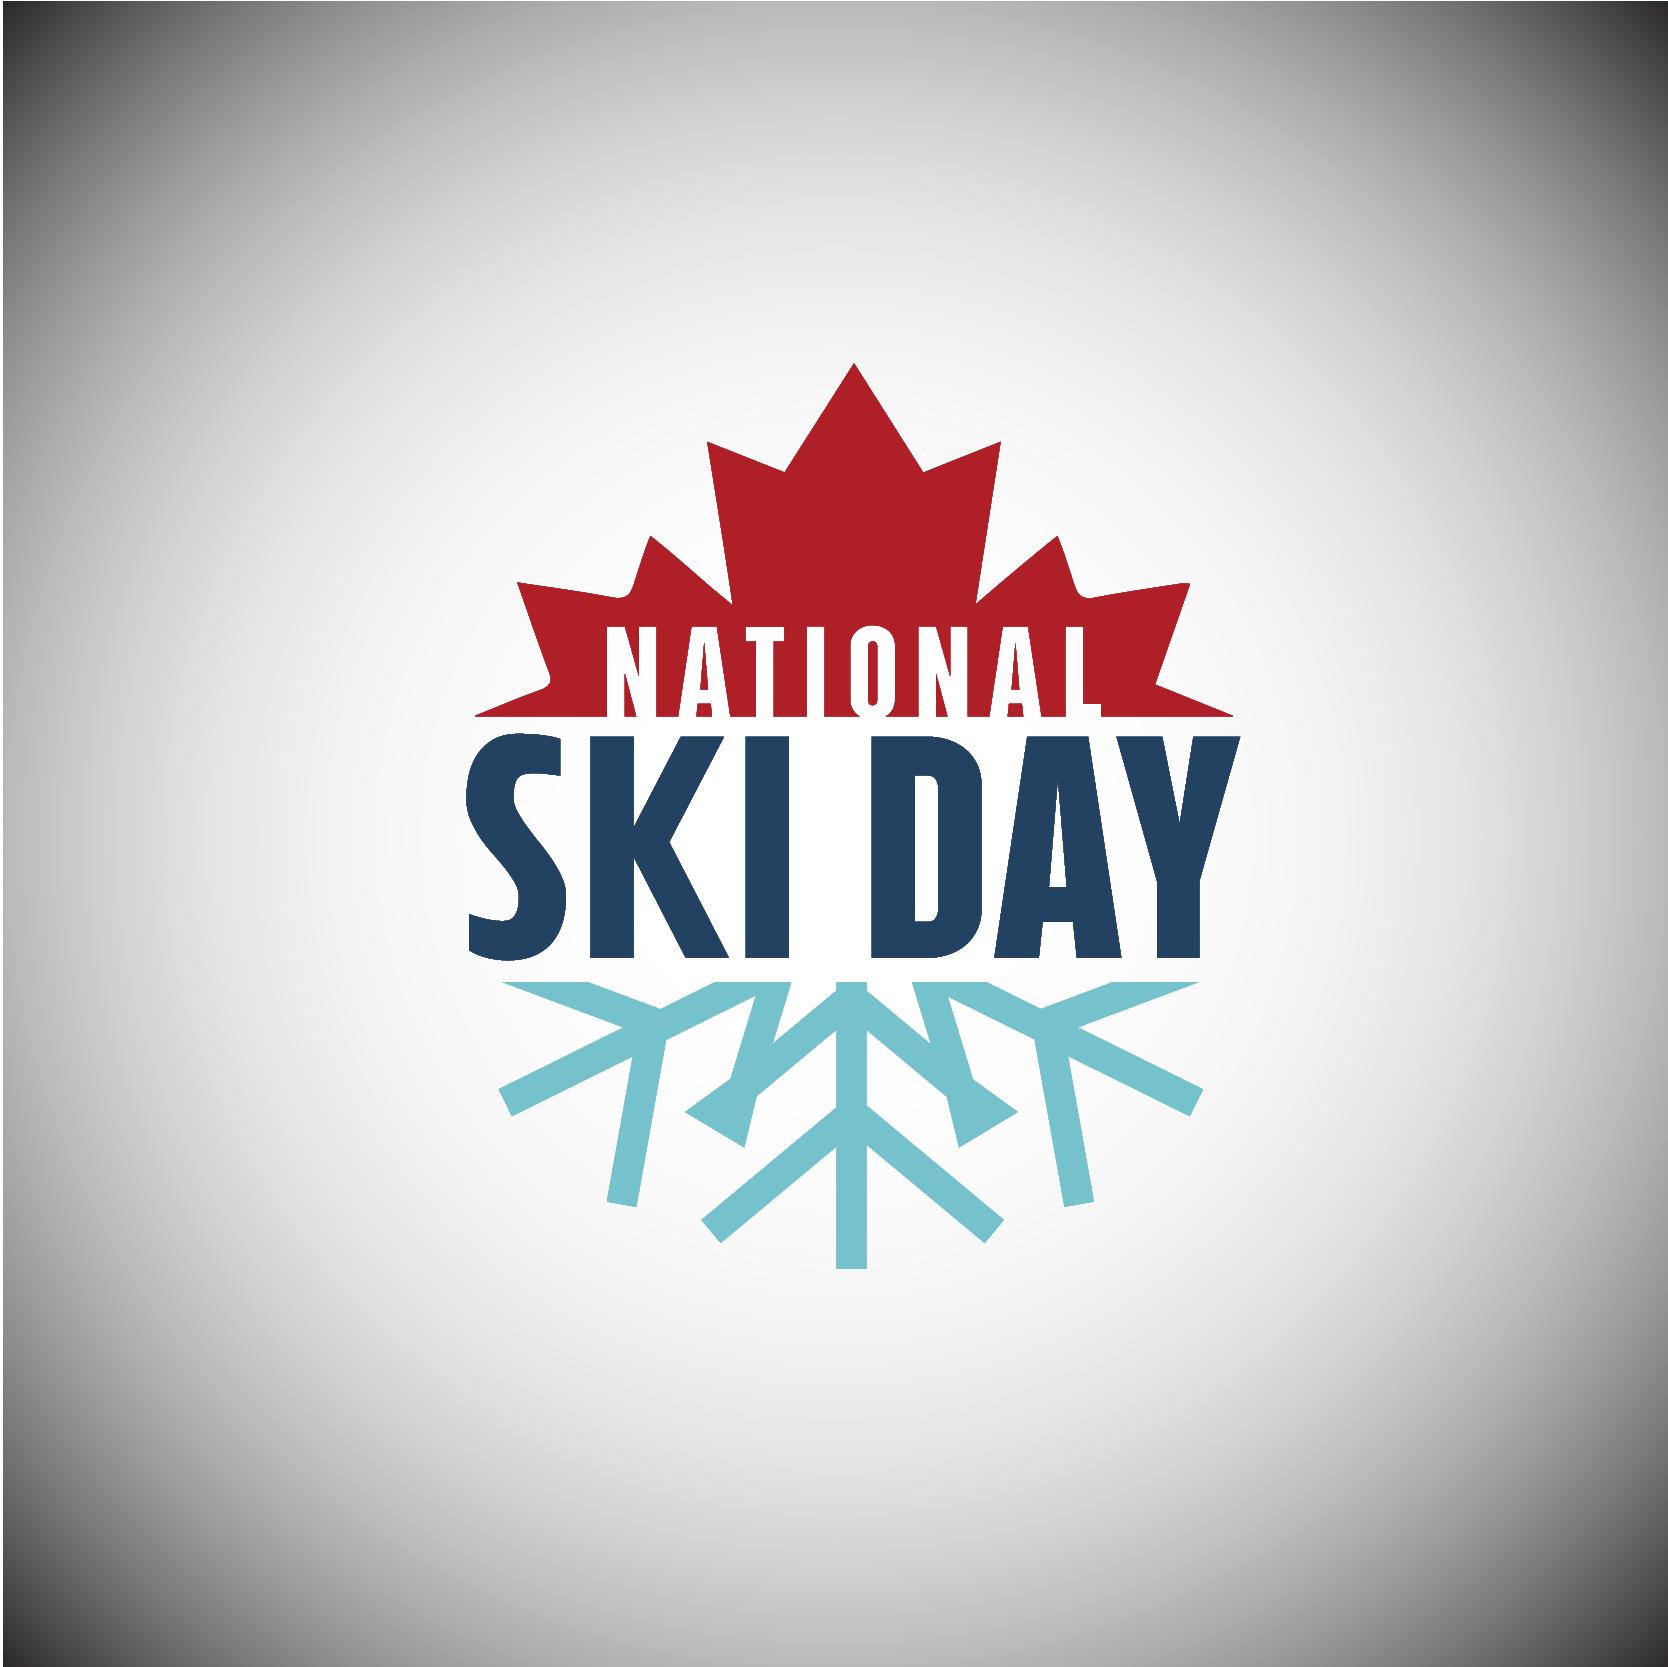 national-ski-day-logo.png